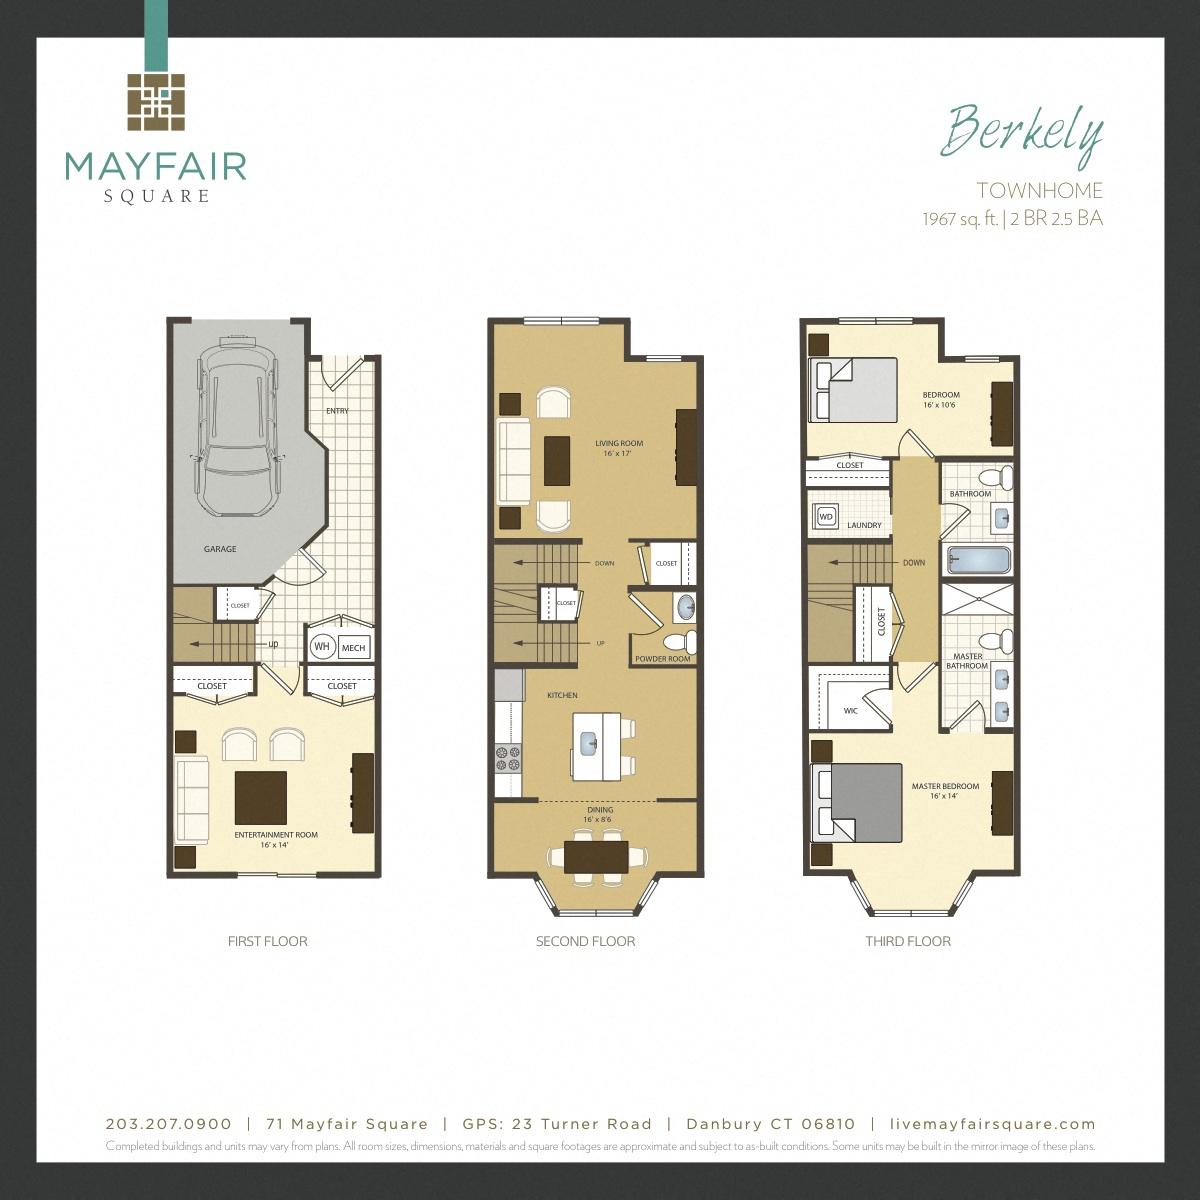 RMS Rentals: Apartments For Rent In Danbury